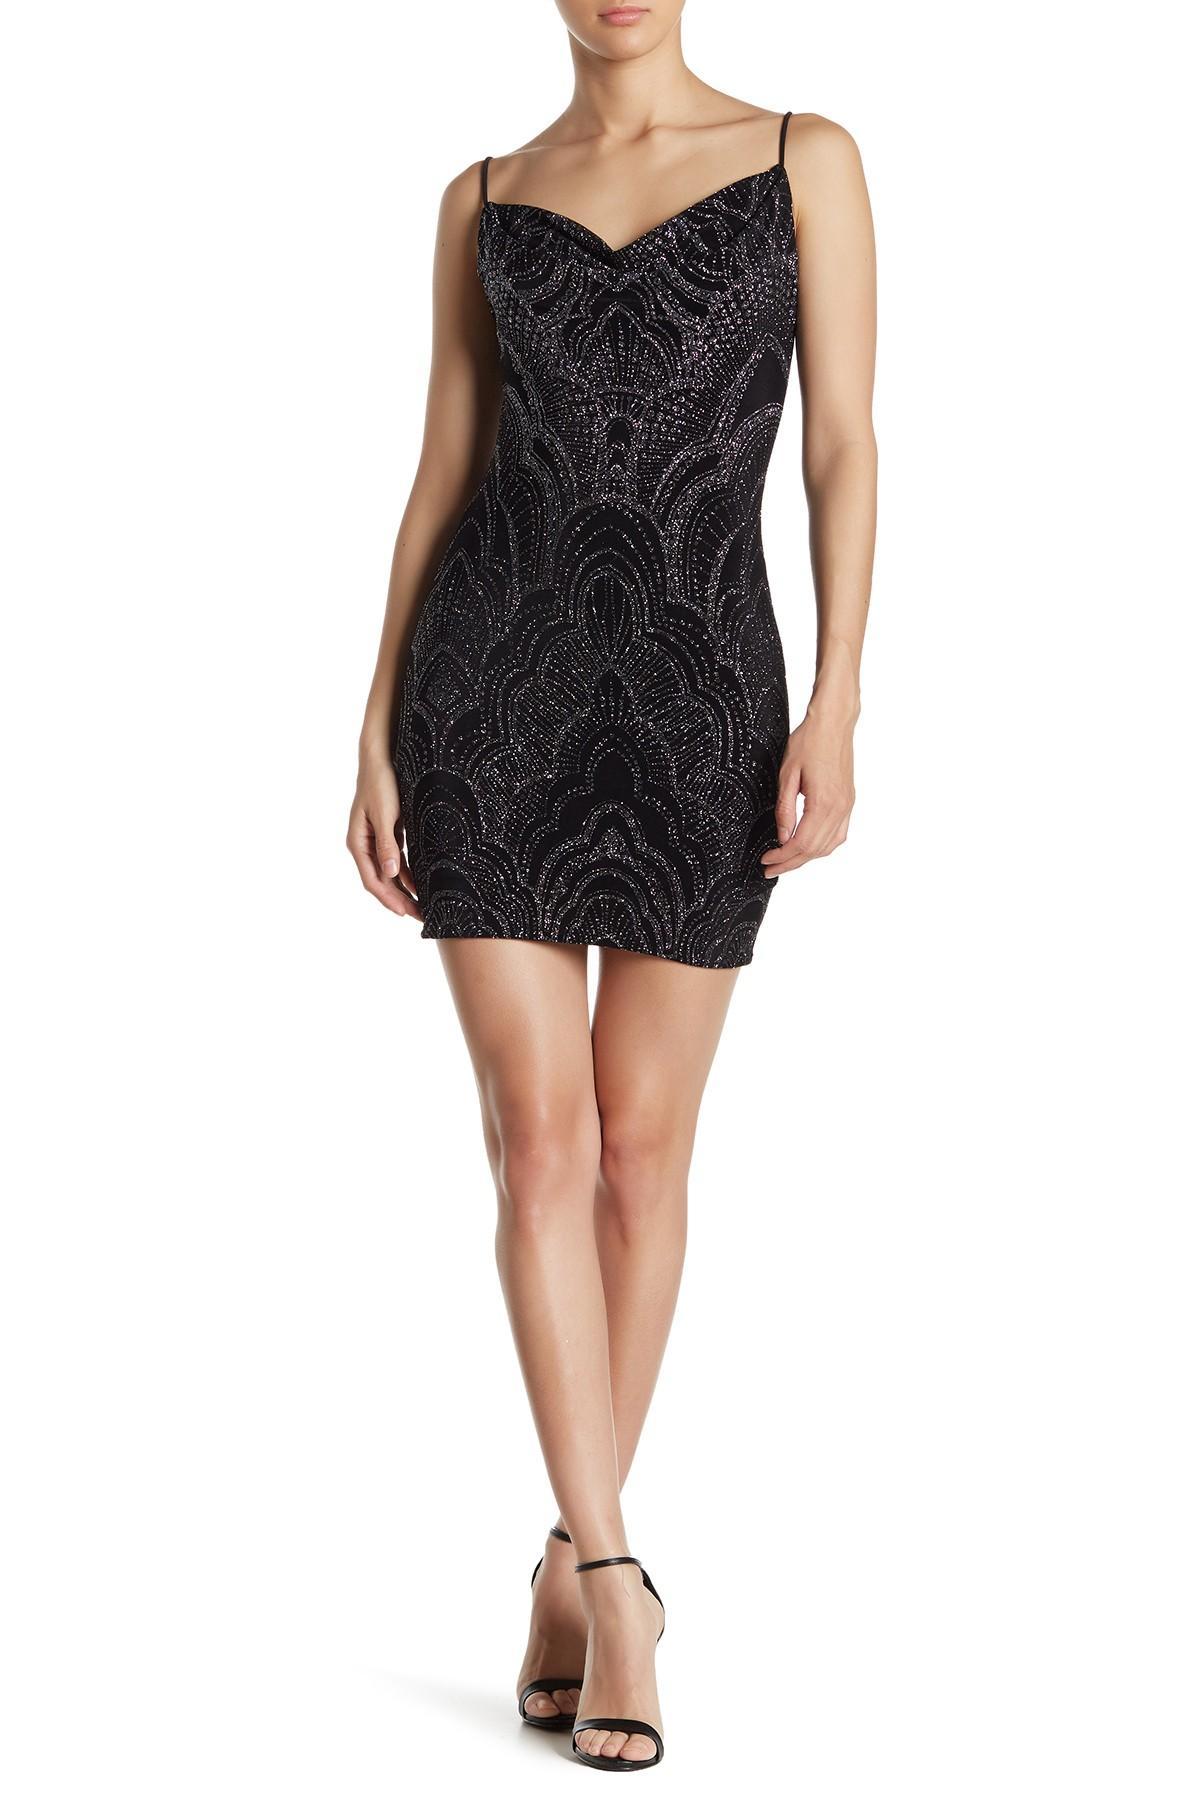 Black textured glitter cowl neck bodycon dress image designer names